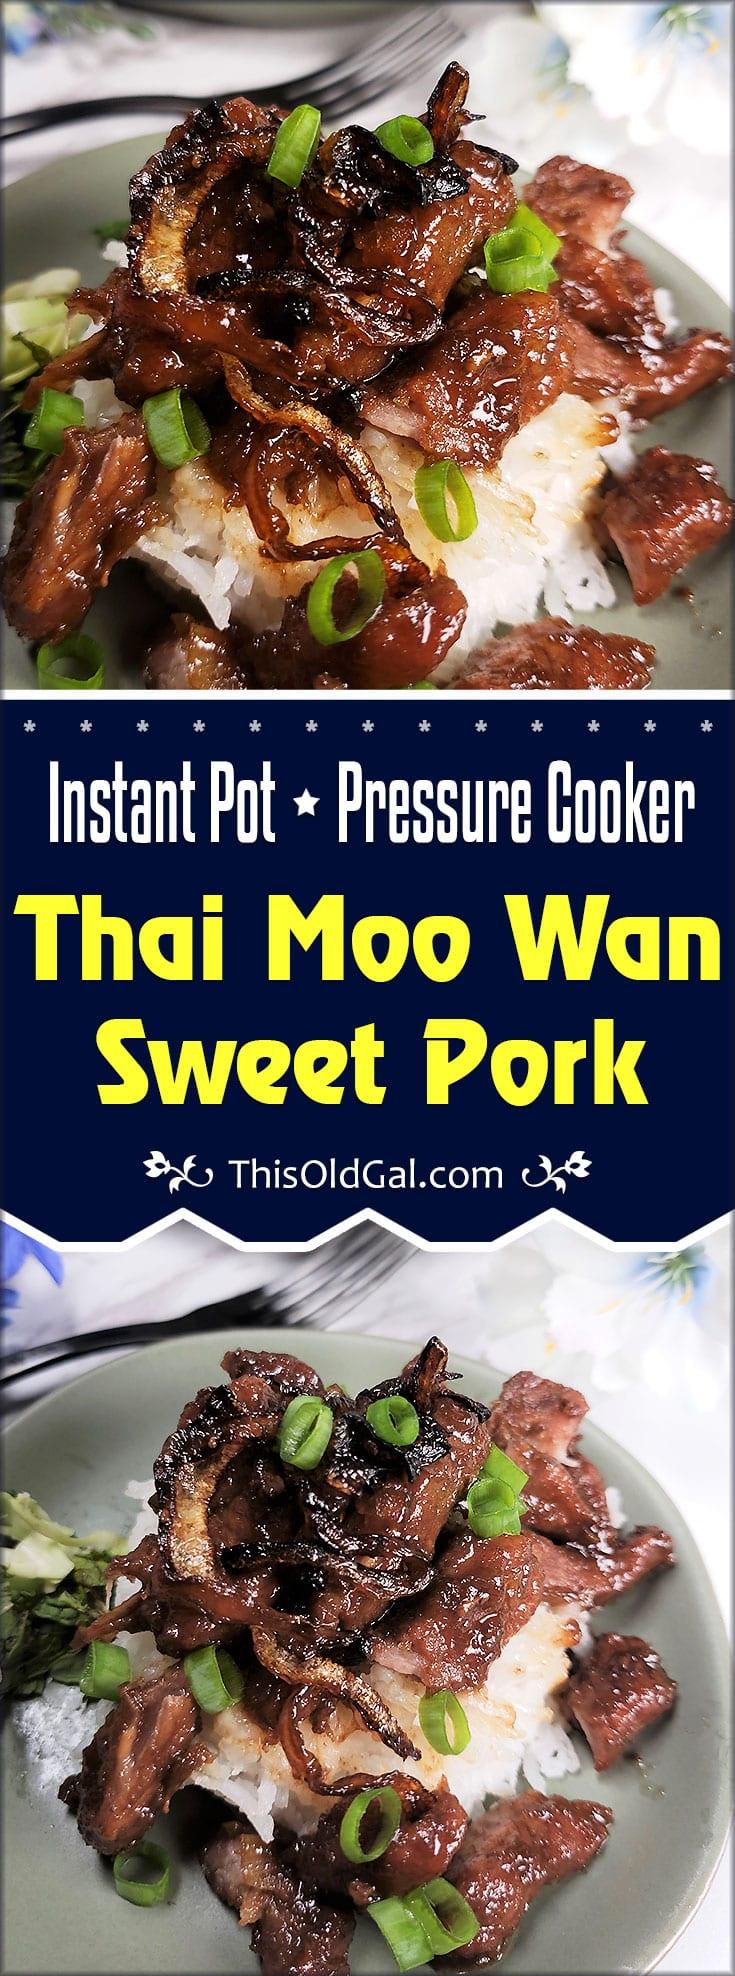 Instant Pot Pressure Cooker Thai Moo Wan Sweet Pork